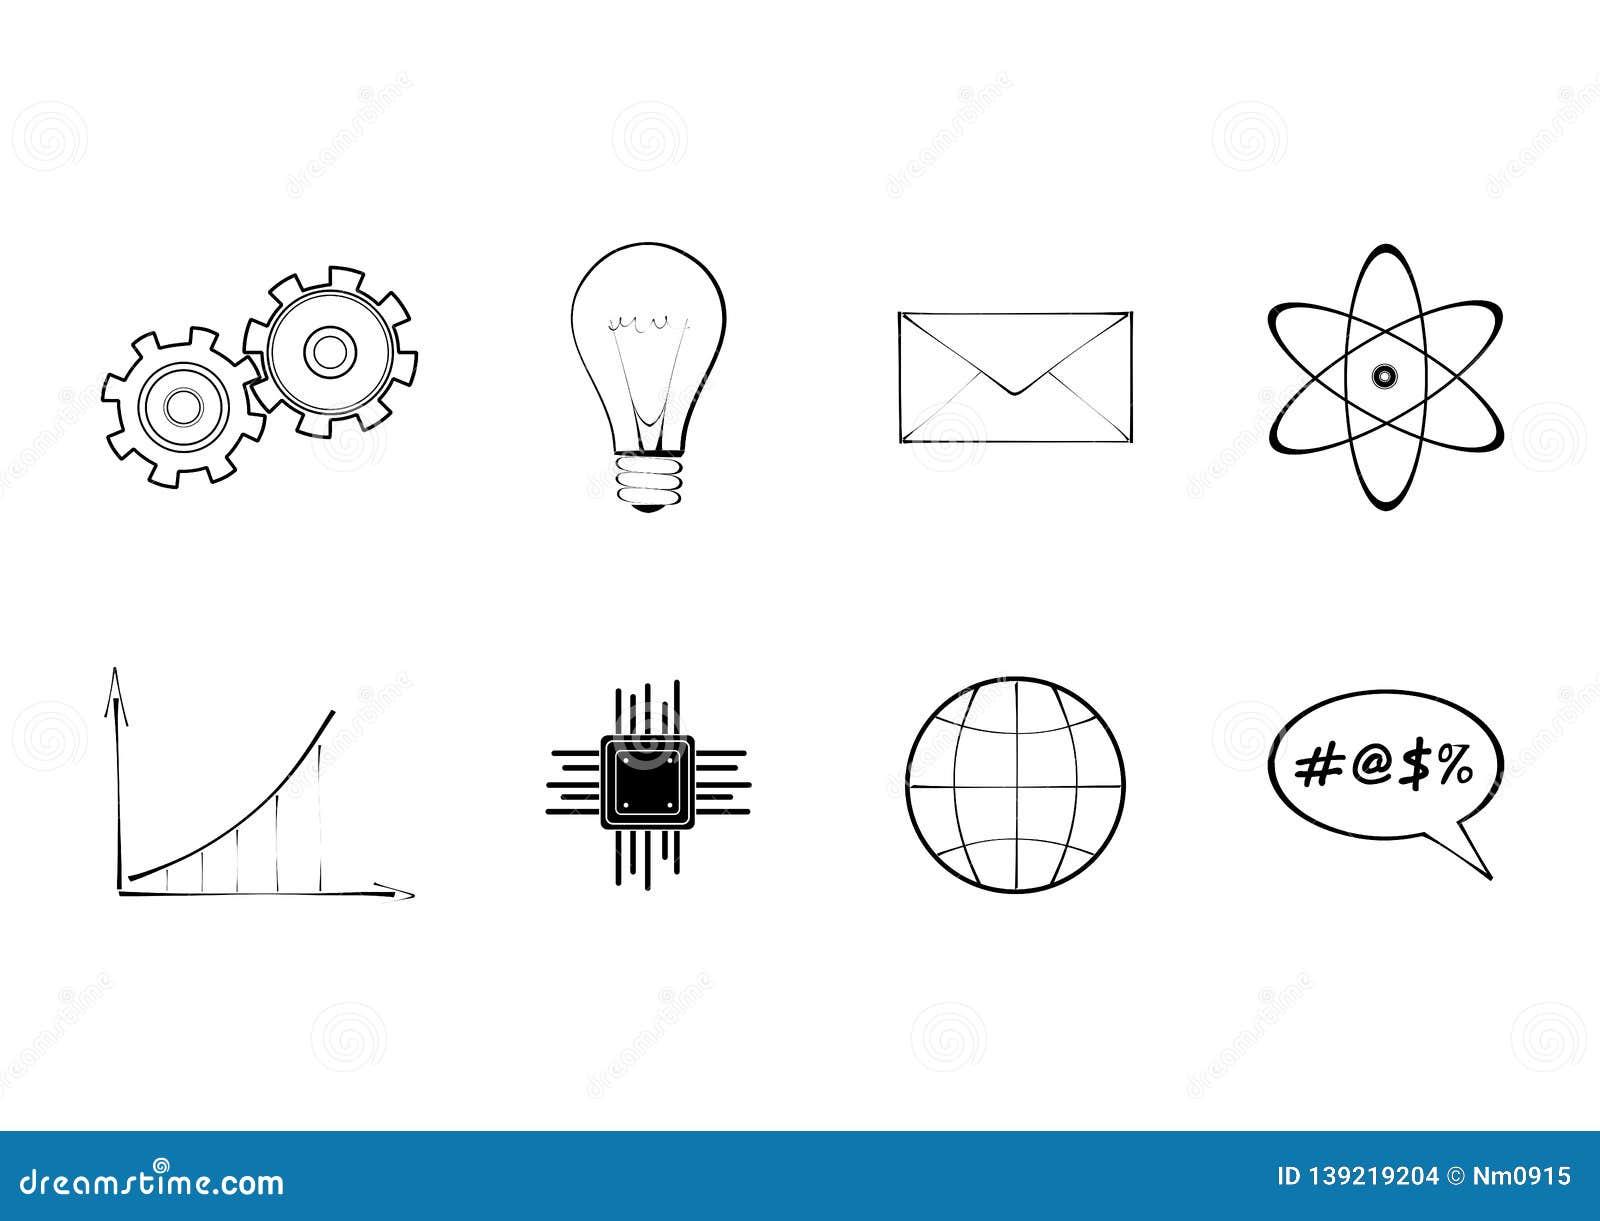 Envelope Schematic - Wiring Diagrams Dock